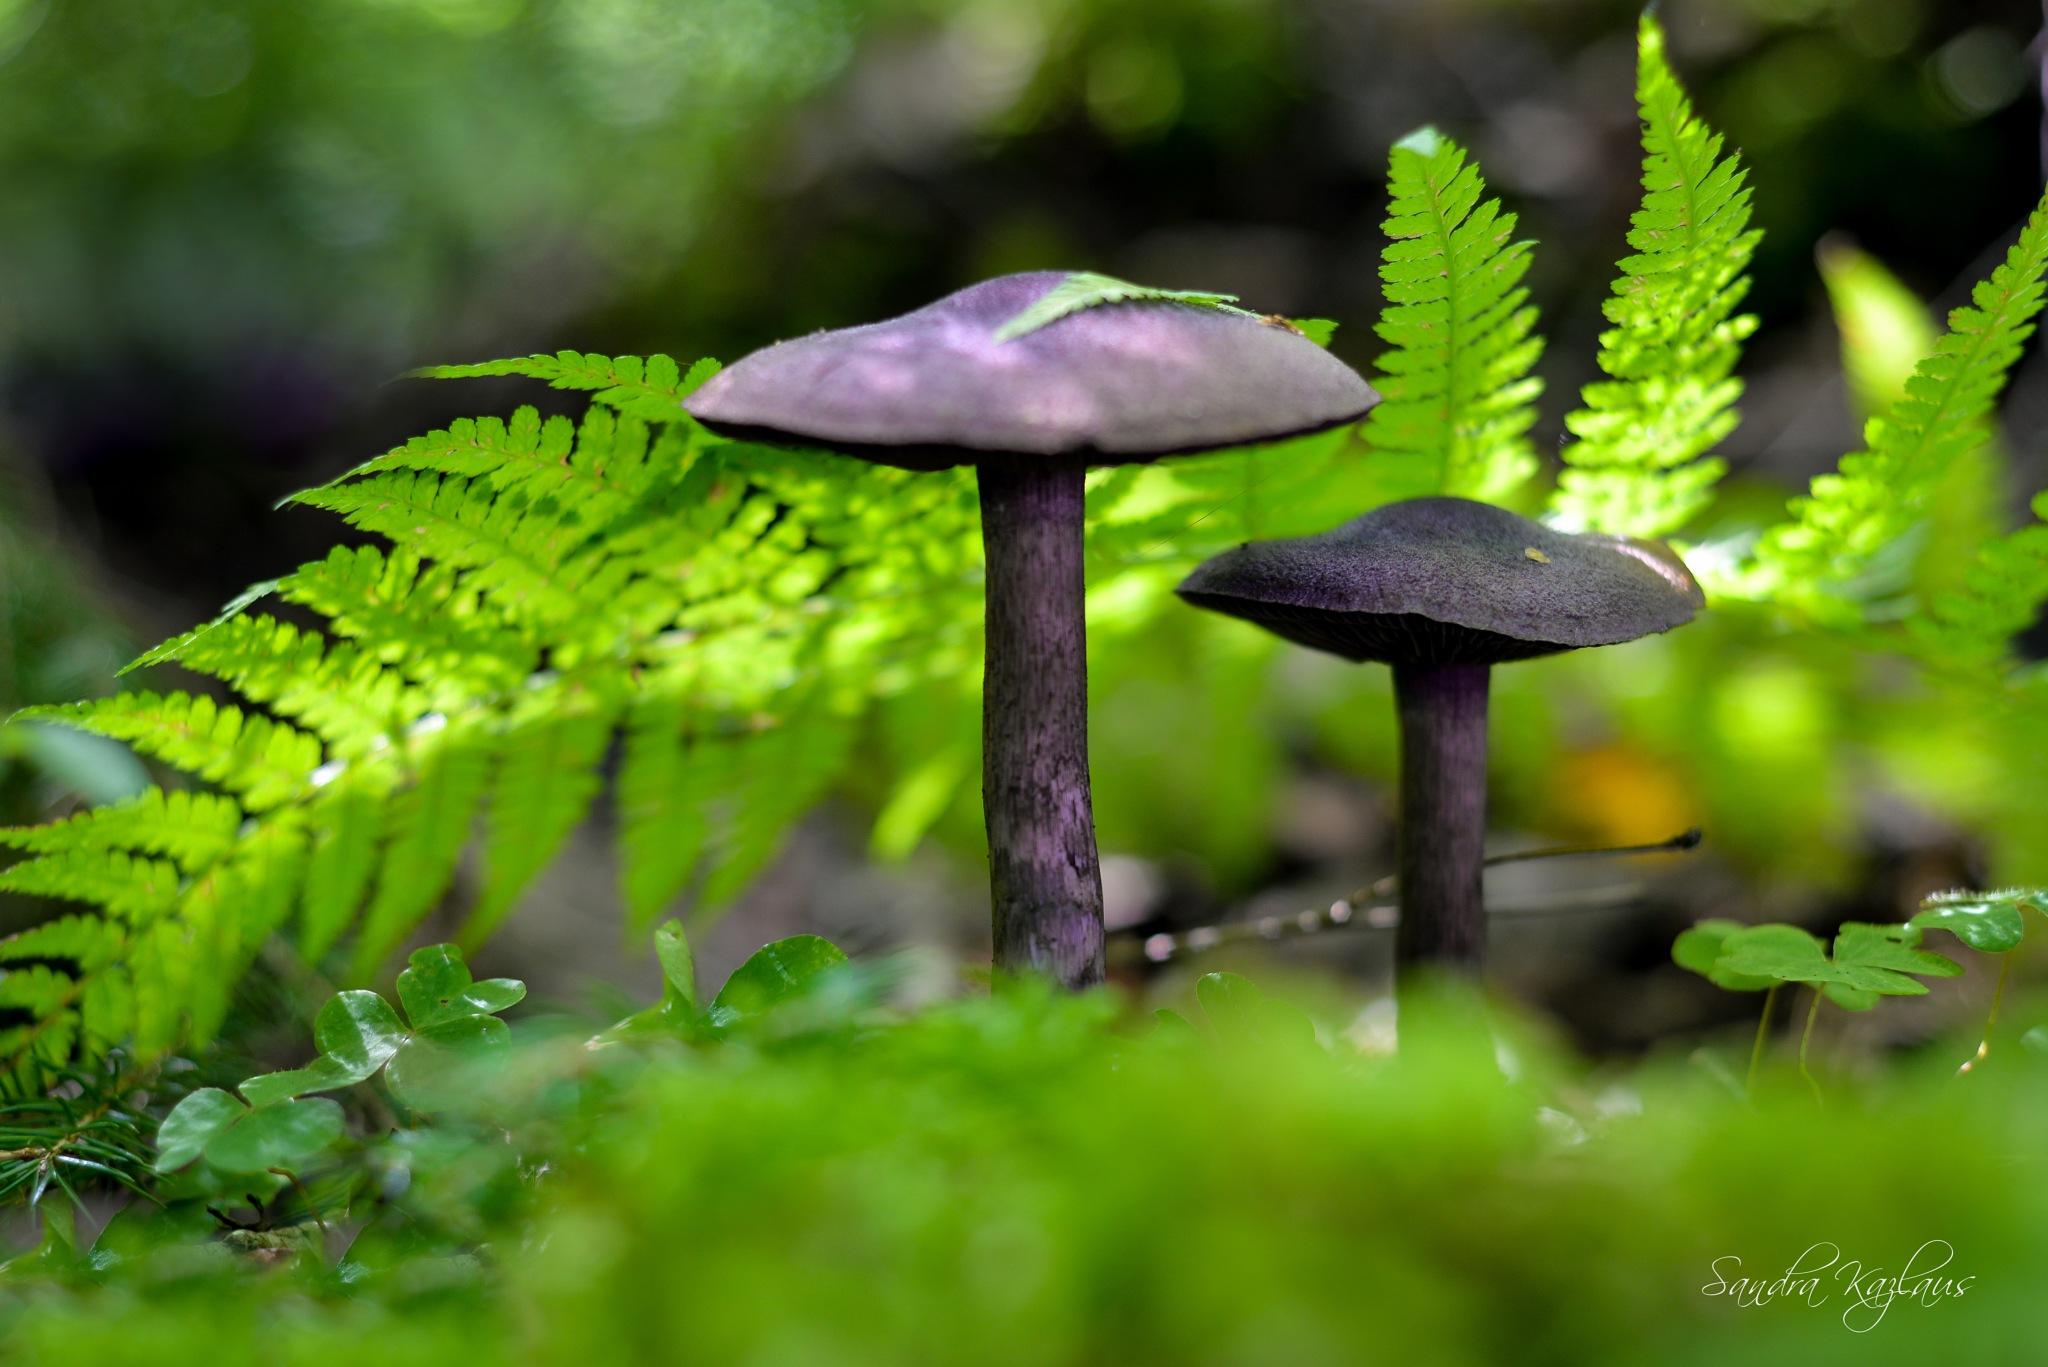 ...mushrooms... by Sandra Kazlaus